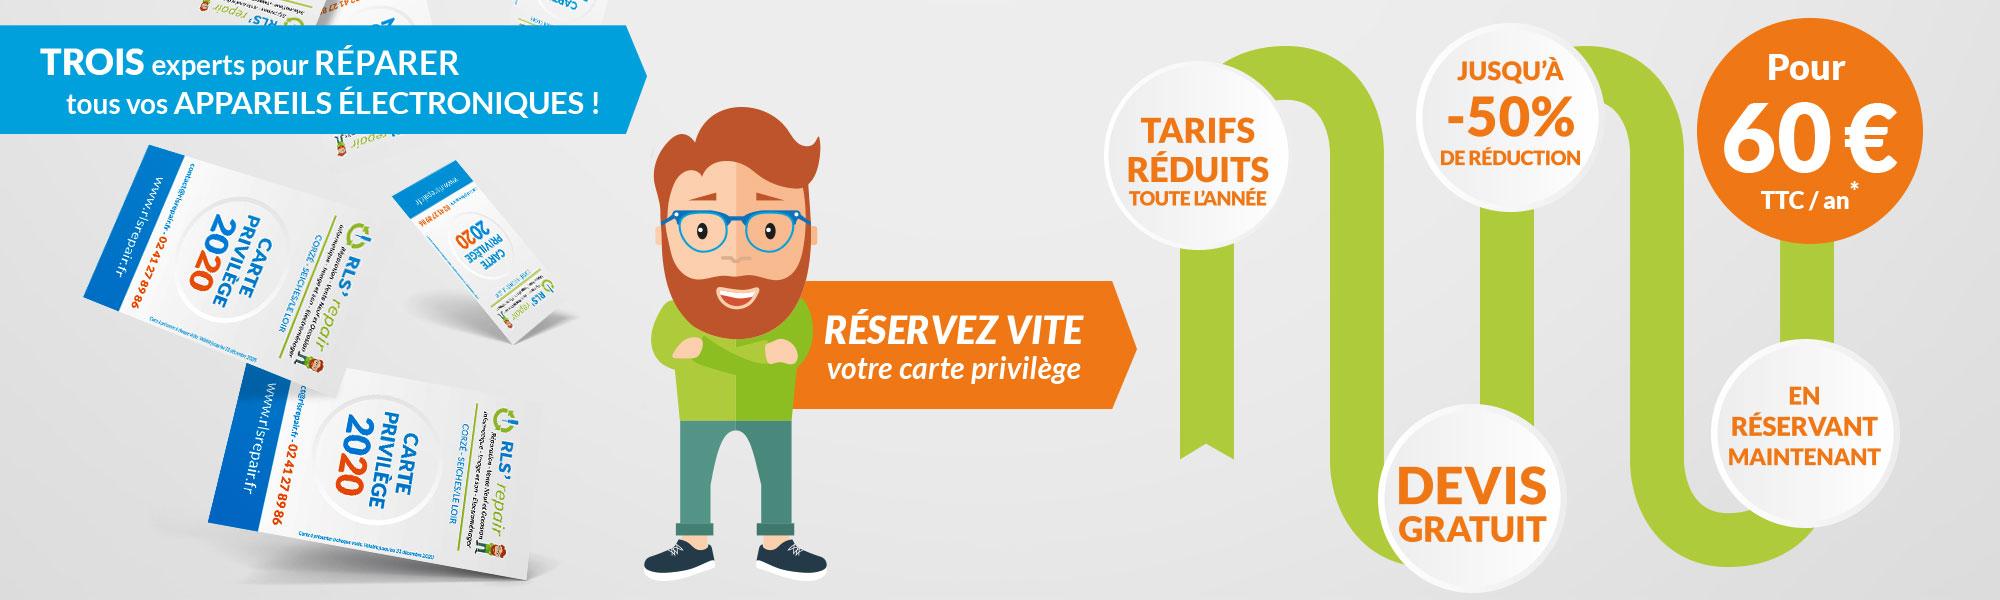 Carte privilège 2020 : promotion